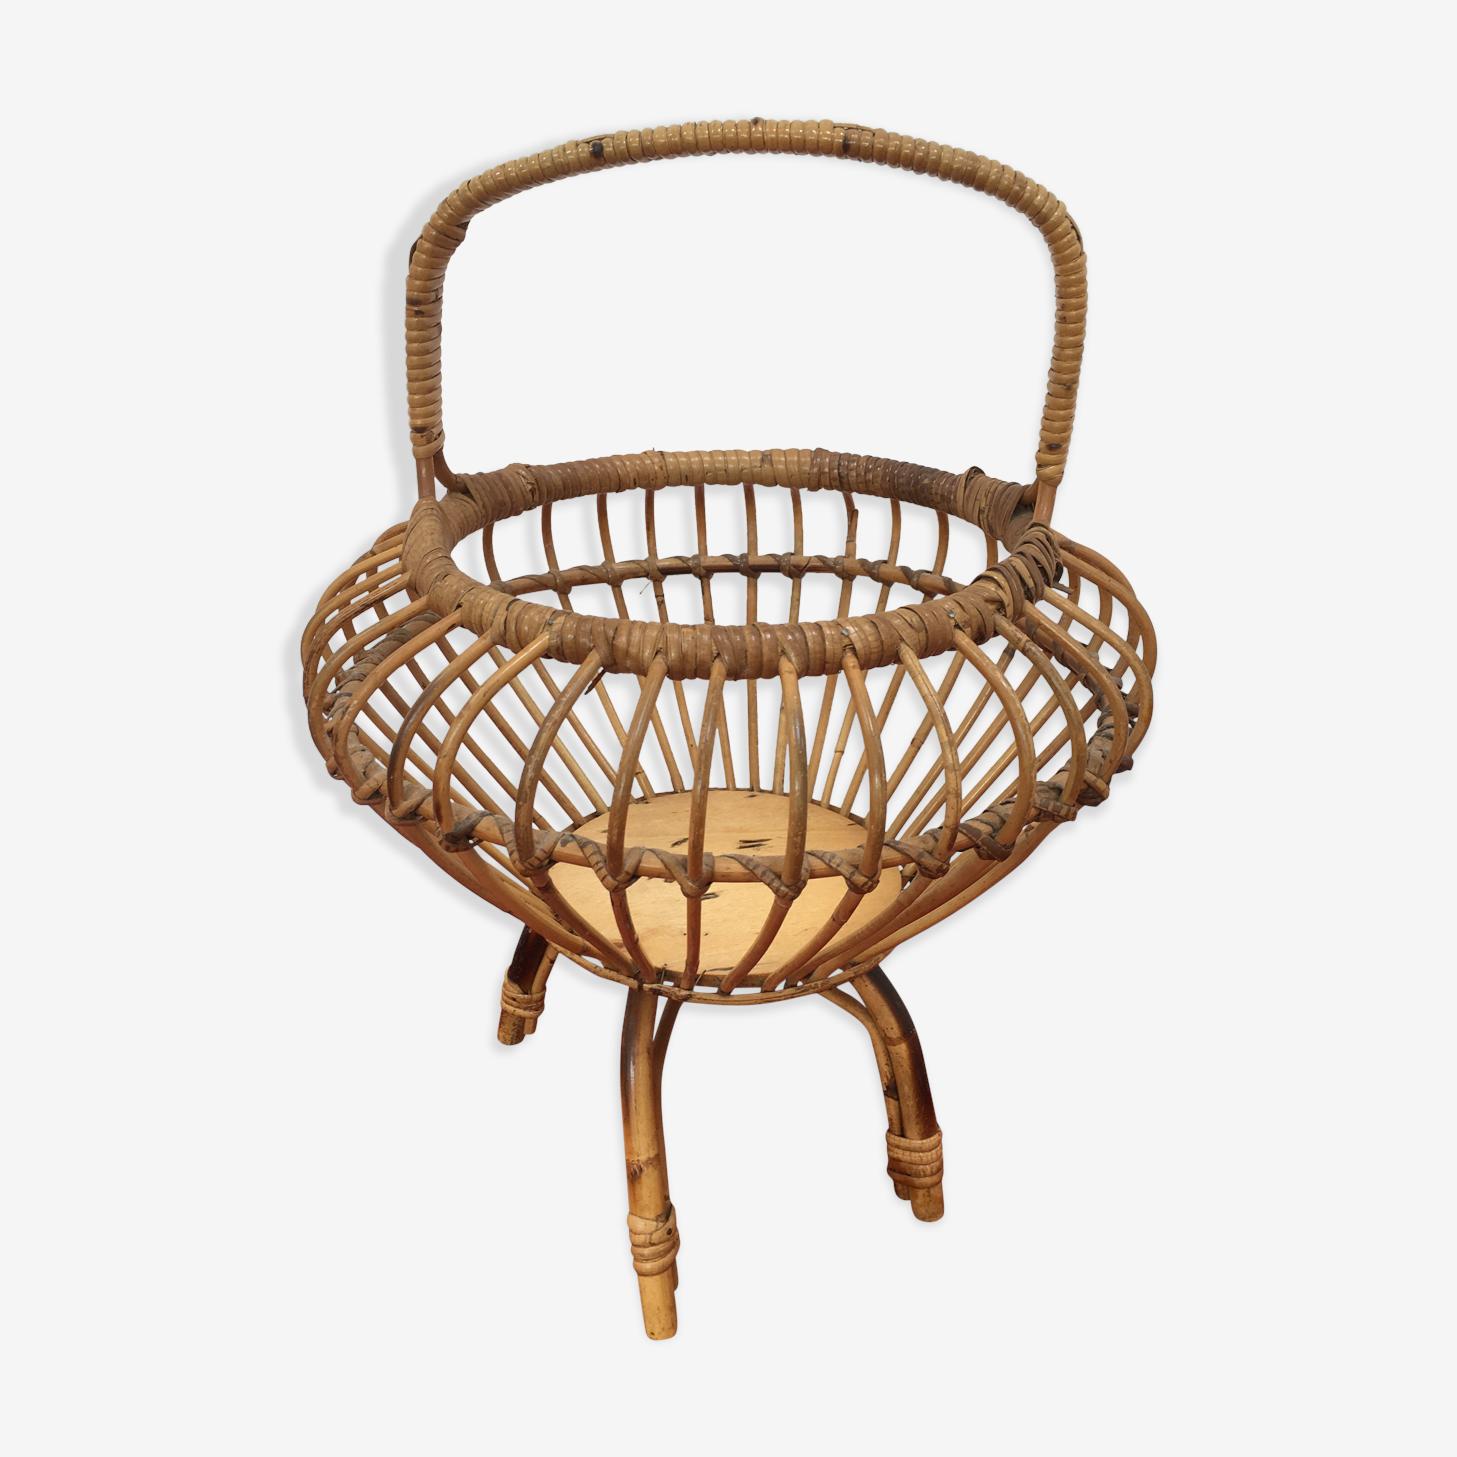 Travailleuse vintage en rotin et bambou